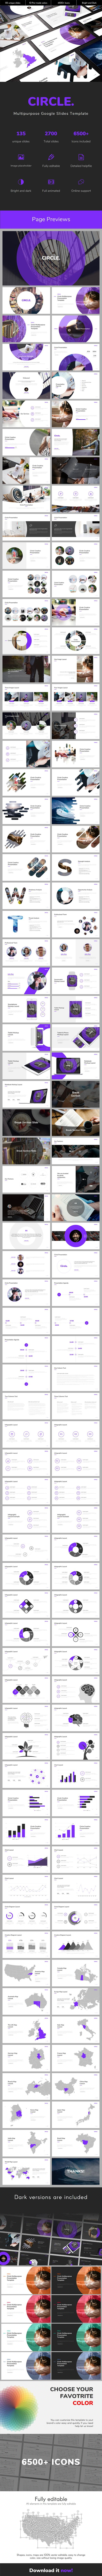 Circle Multipurpose Google Slides Template - Google Slides Presentation Templates